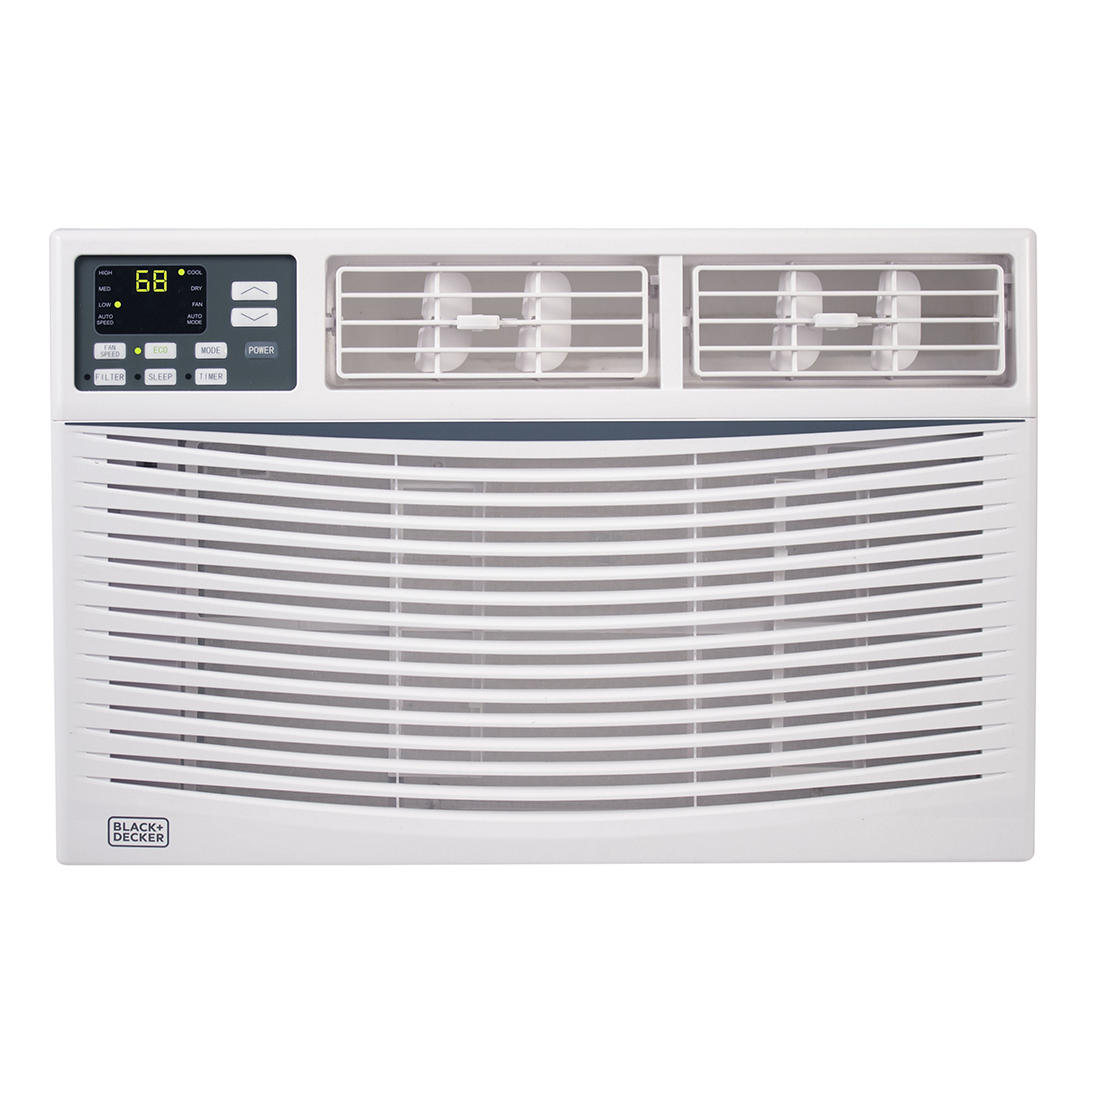 Black & Decker 10,000-BTU 2-in-1 Window Air Conditioner with Fan Function